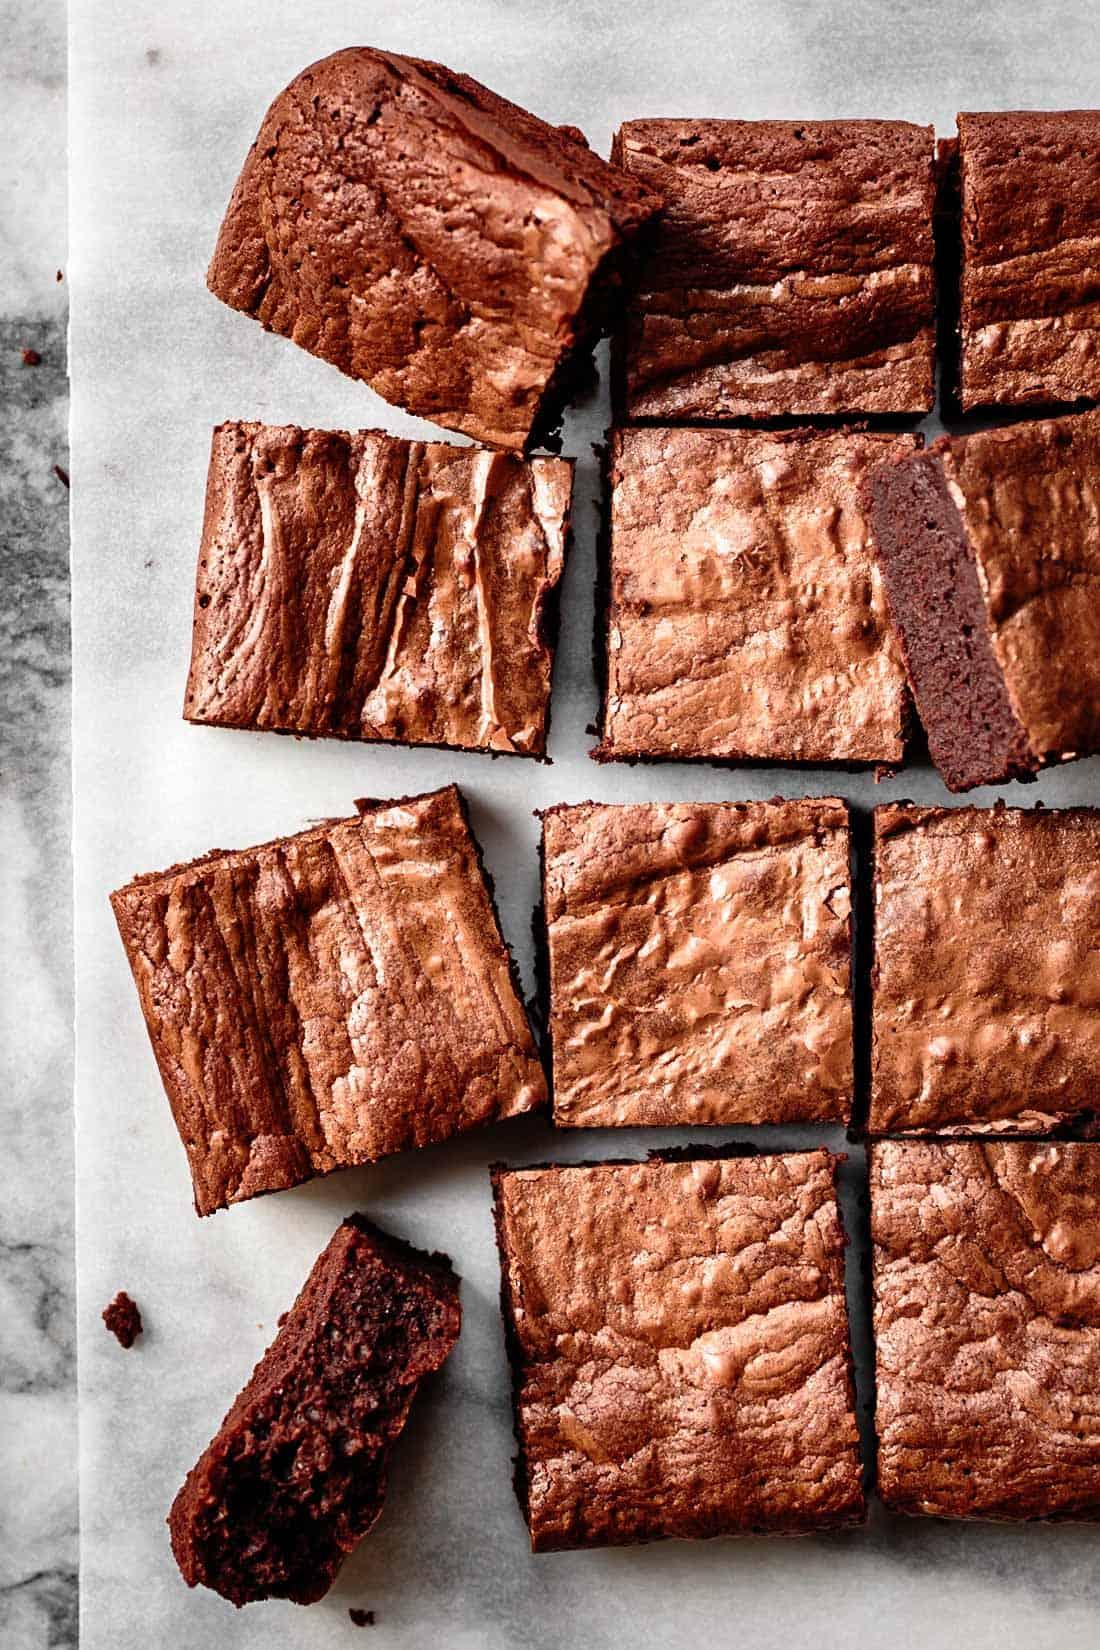 gluten-free treats: gf brownies